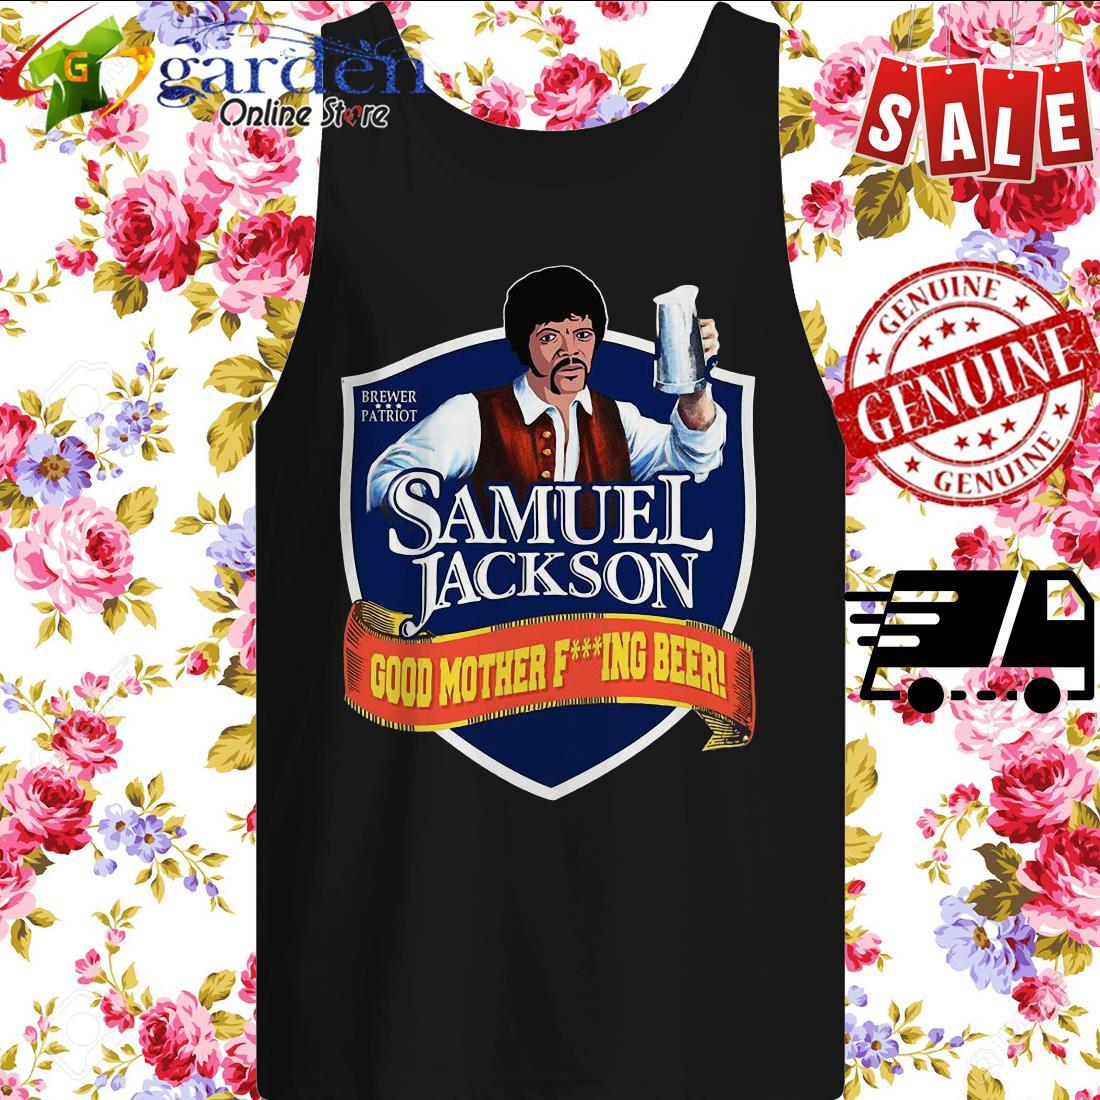 Samuel Jackson good mother fucking Beer tank top